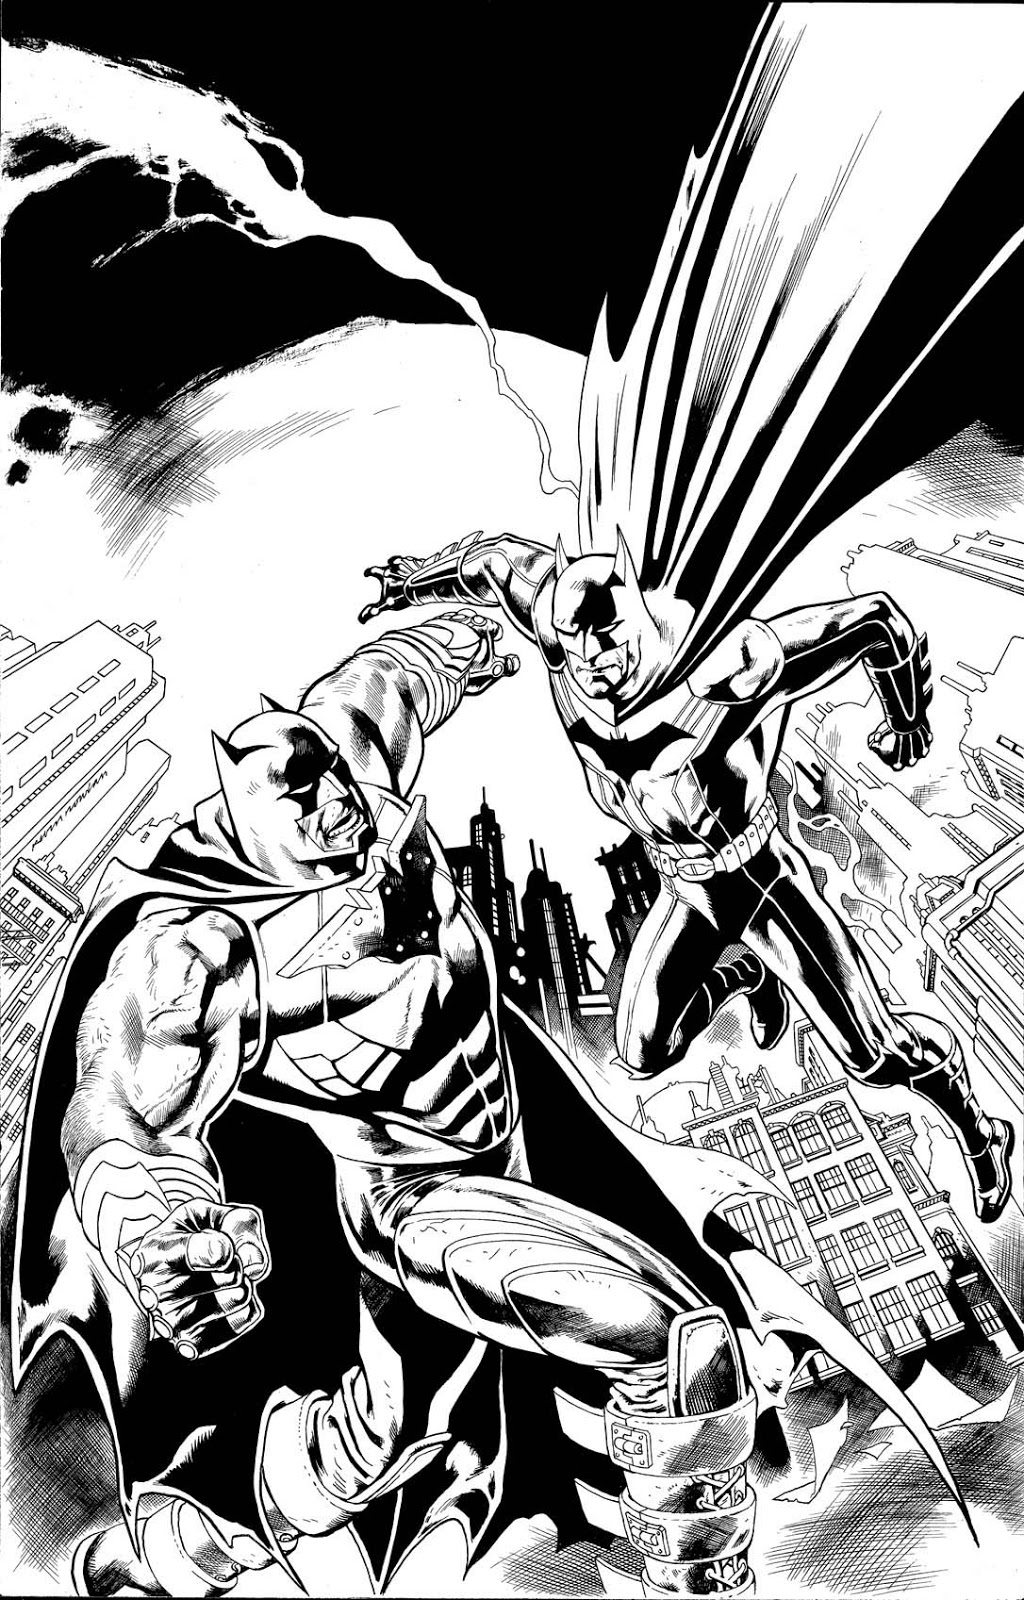 Comic Book Cover Drawing : Kevin nowlan batman vs bat bane variant cover art